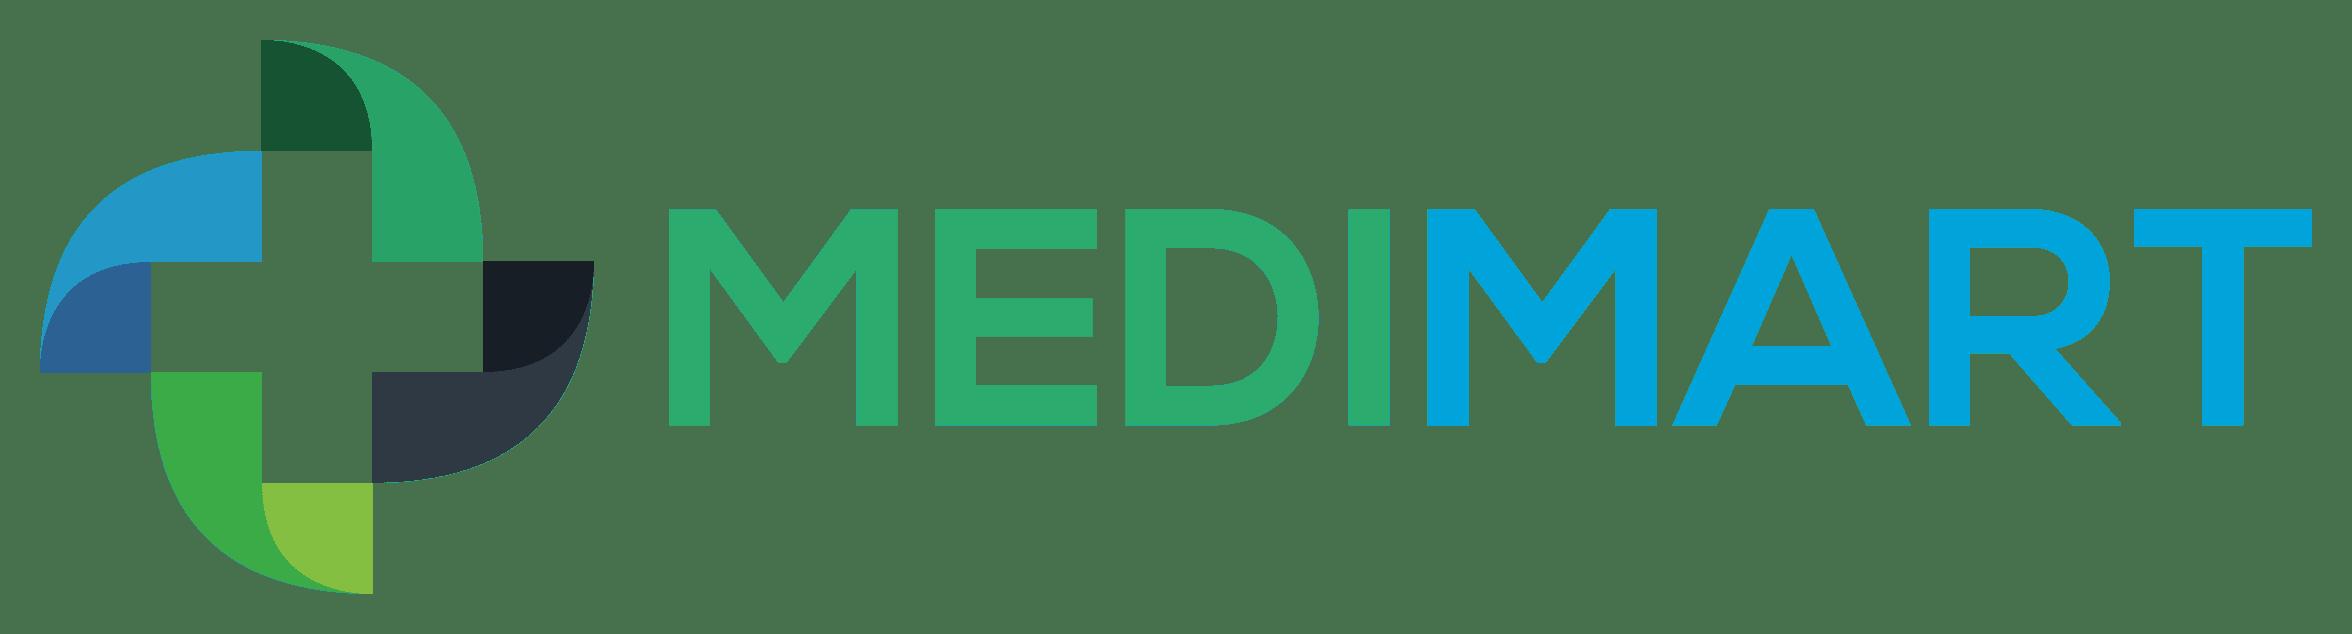 logo van Medimart.nl